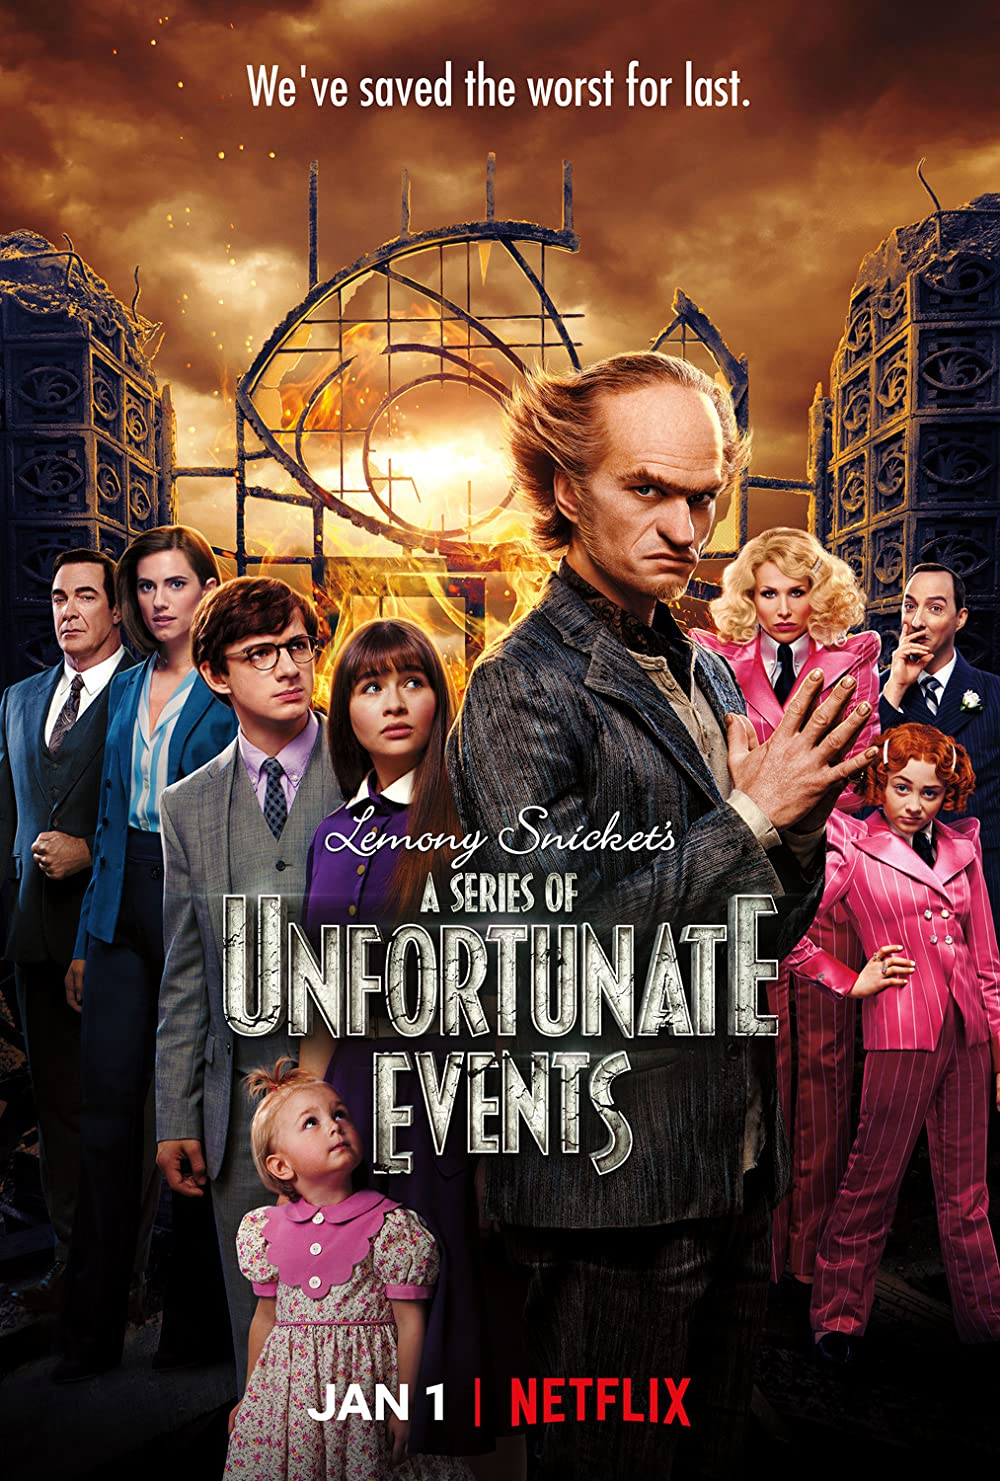 Series of 2 season a events torrent unfortunate 레모니 스니캣의